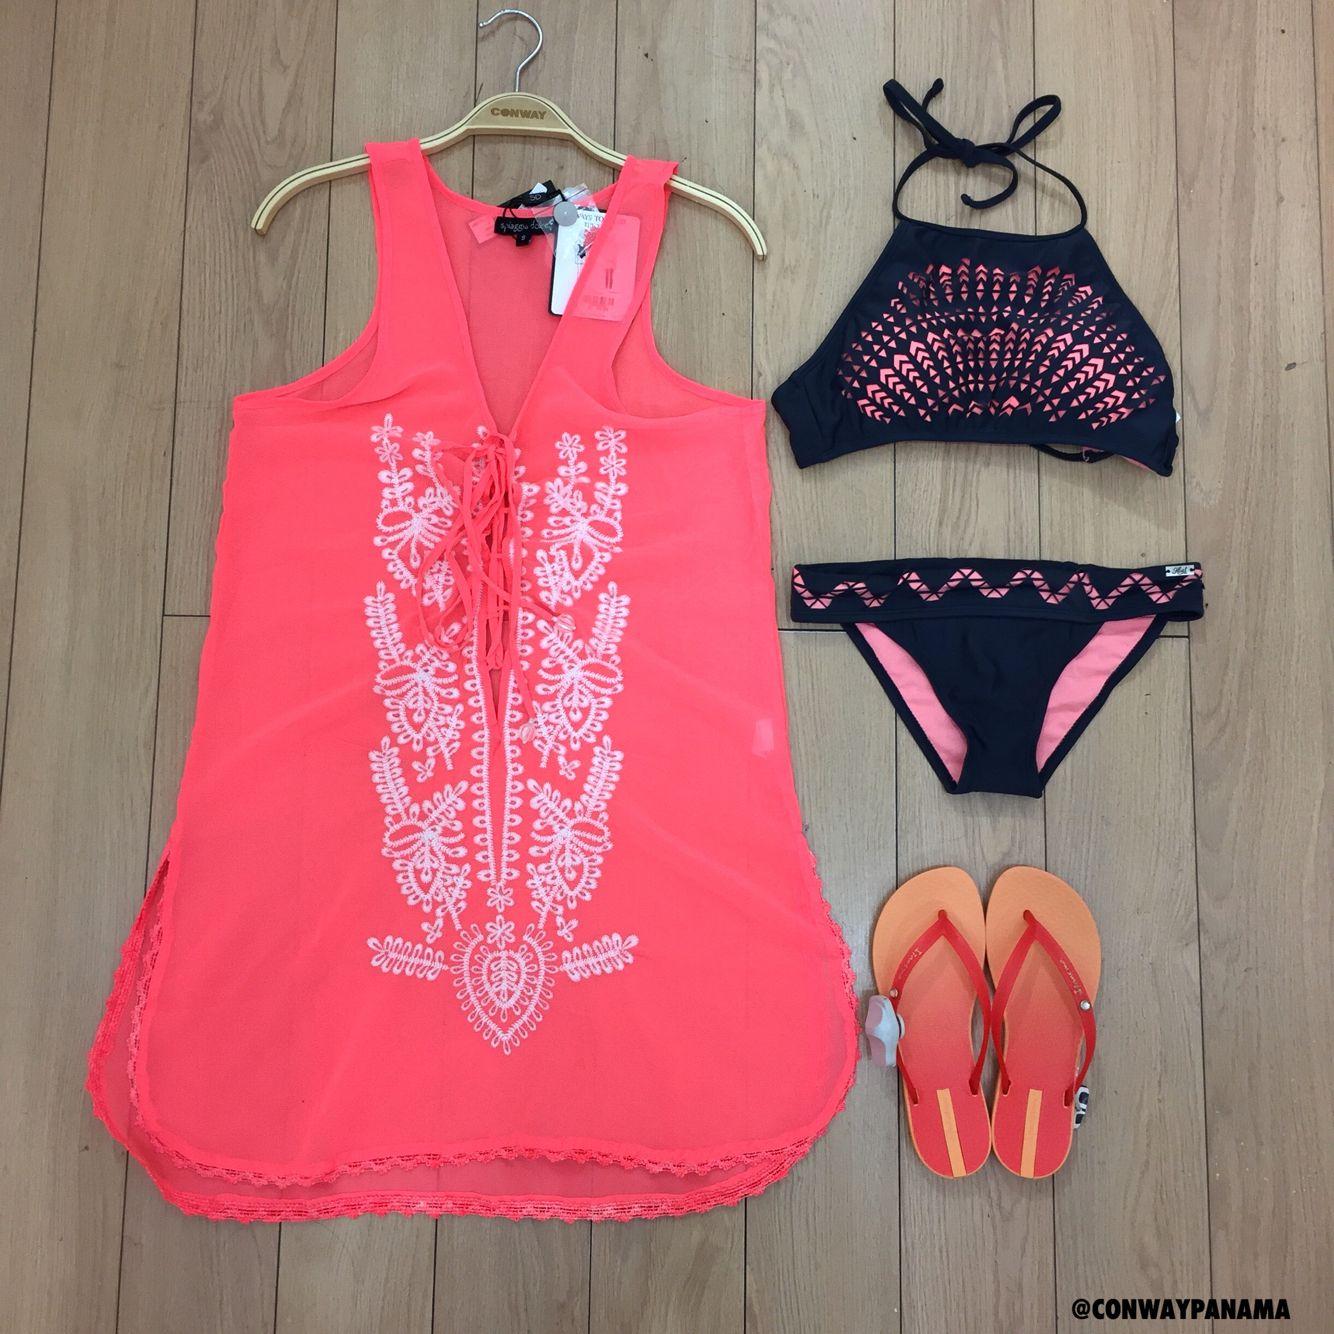 #Outfit #OutfitOfTheDay #OOTD #OutfitDelDía #Ootd #Fashion #FashionPanama #Panama #ModaPanama #Moda #ConwayModa #AsíEsConway #ILikeIt #ConwayEsVerano #Verano